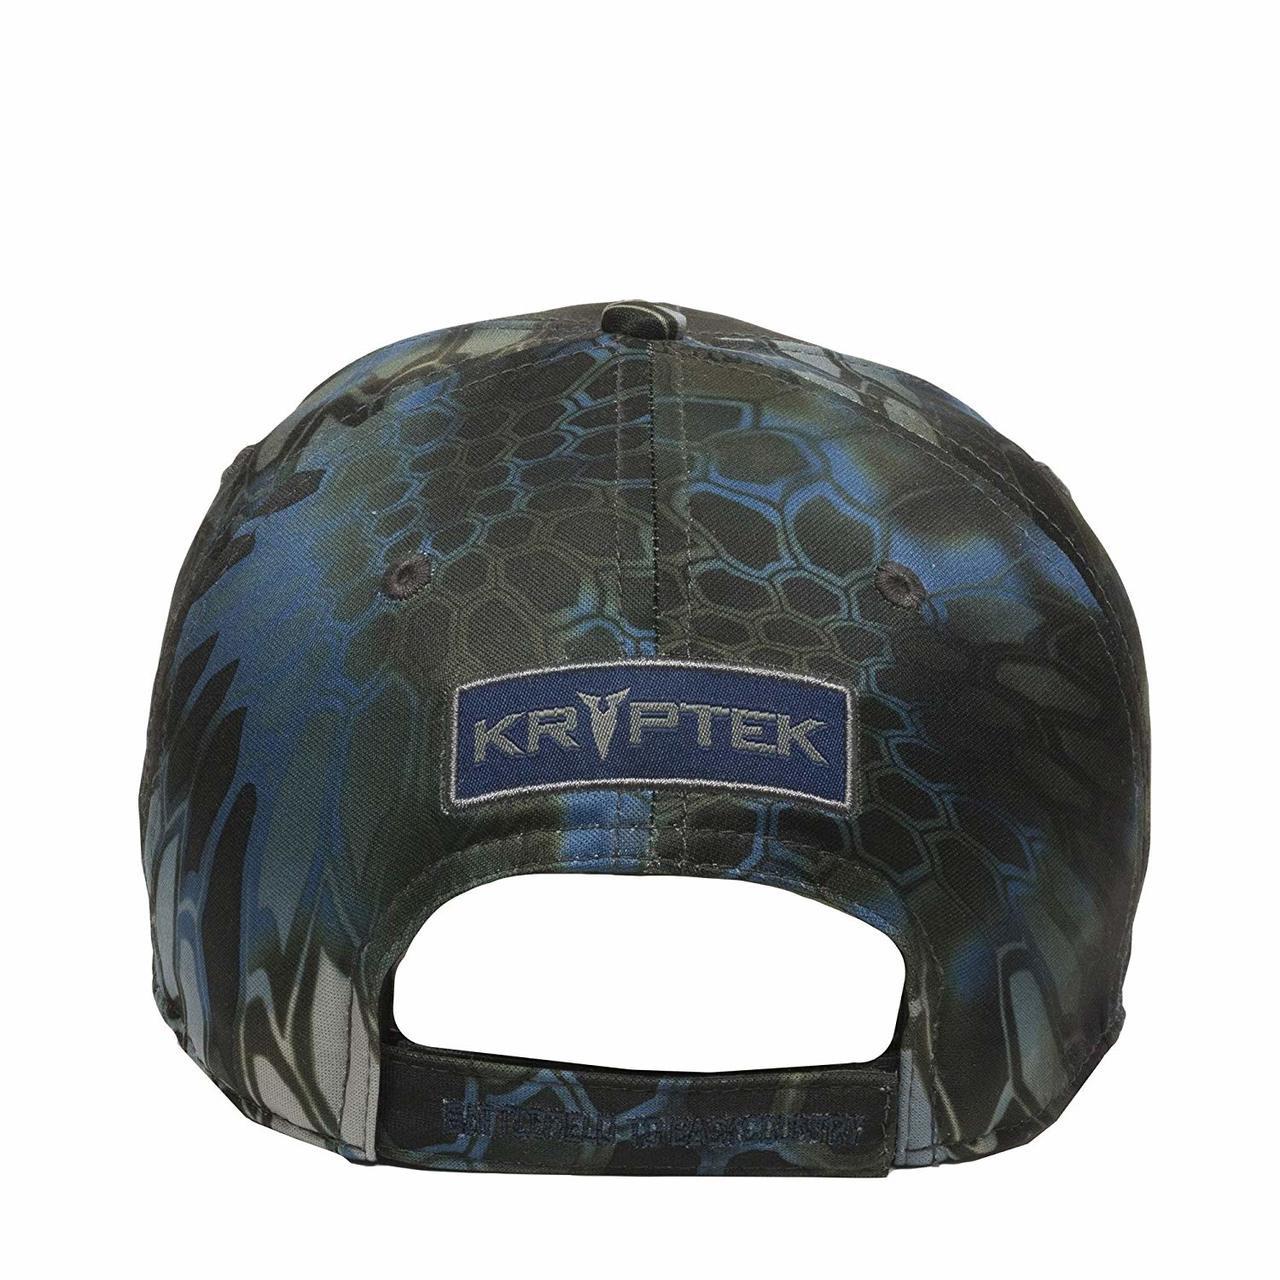 NEW # 15LOGOHN Neptune KRYPTEK SPARTAN LOGO HAT